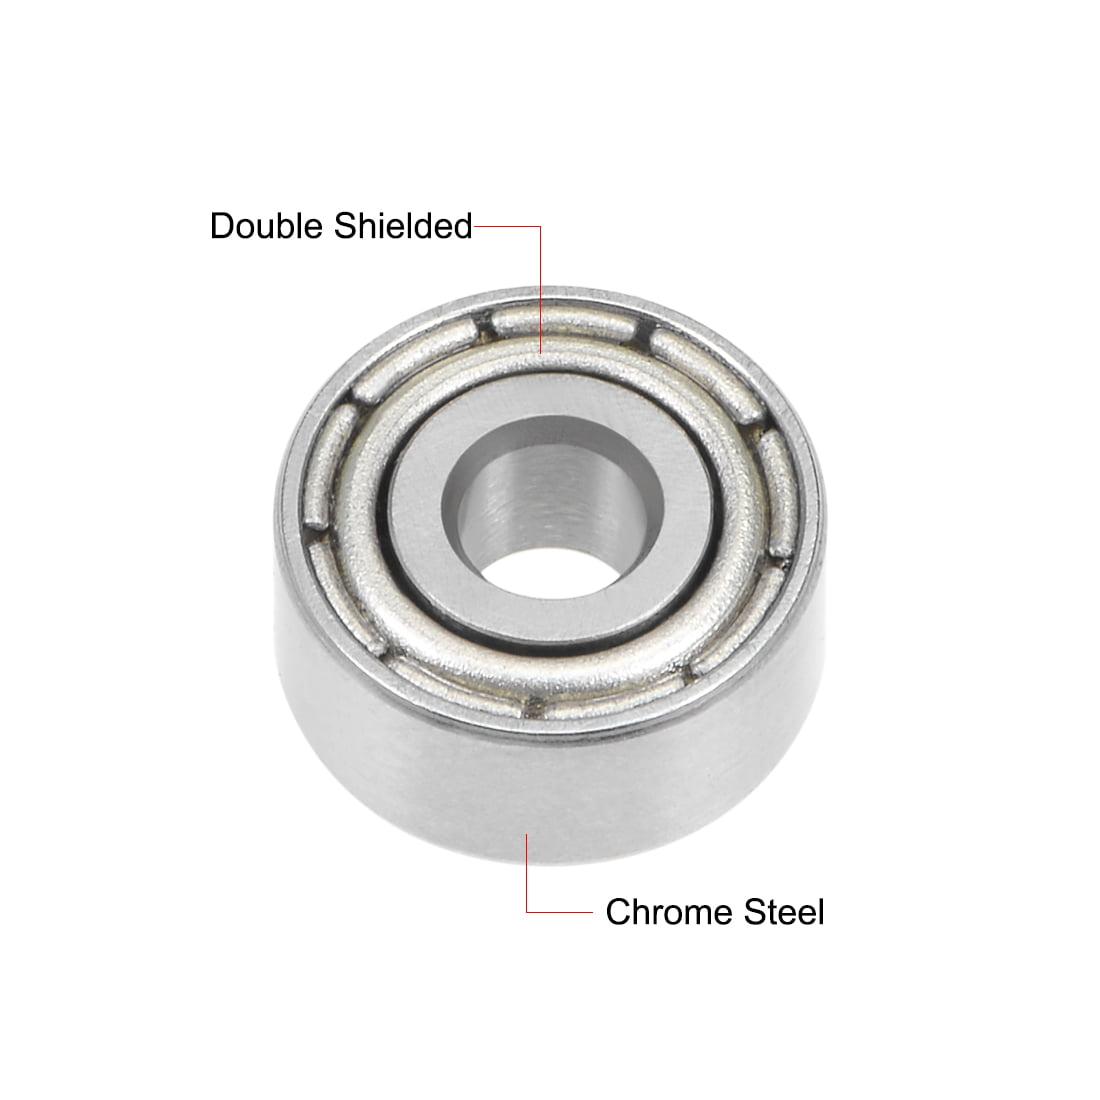 MR93ZZ Metal Shielded Deep Groove Miniature Ball Bearing 3x9x4mm